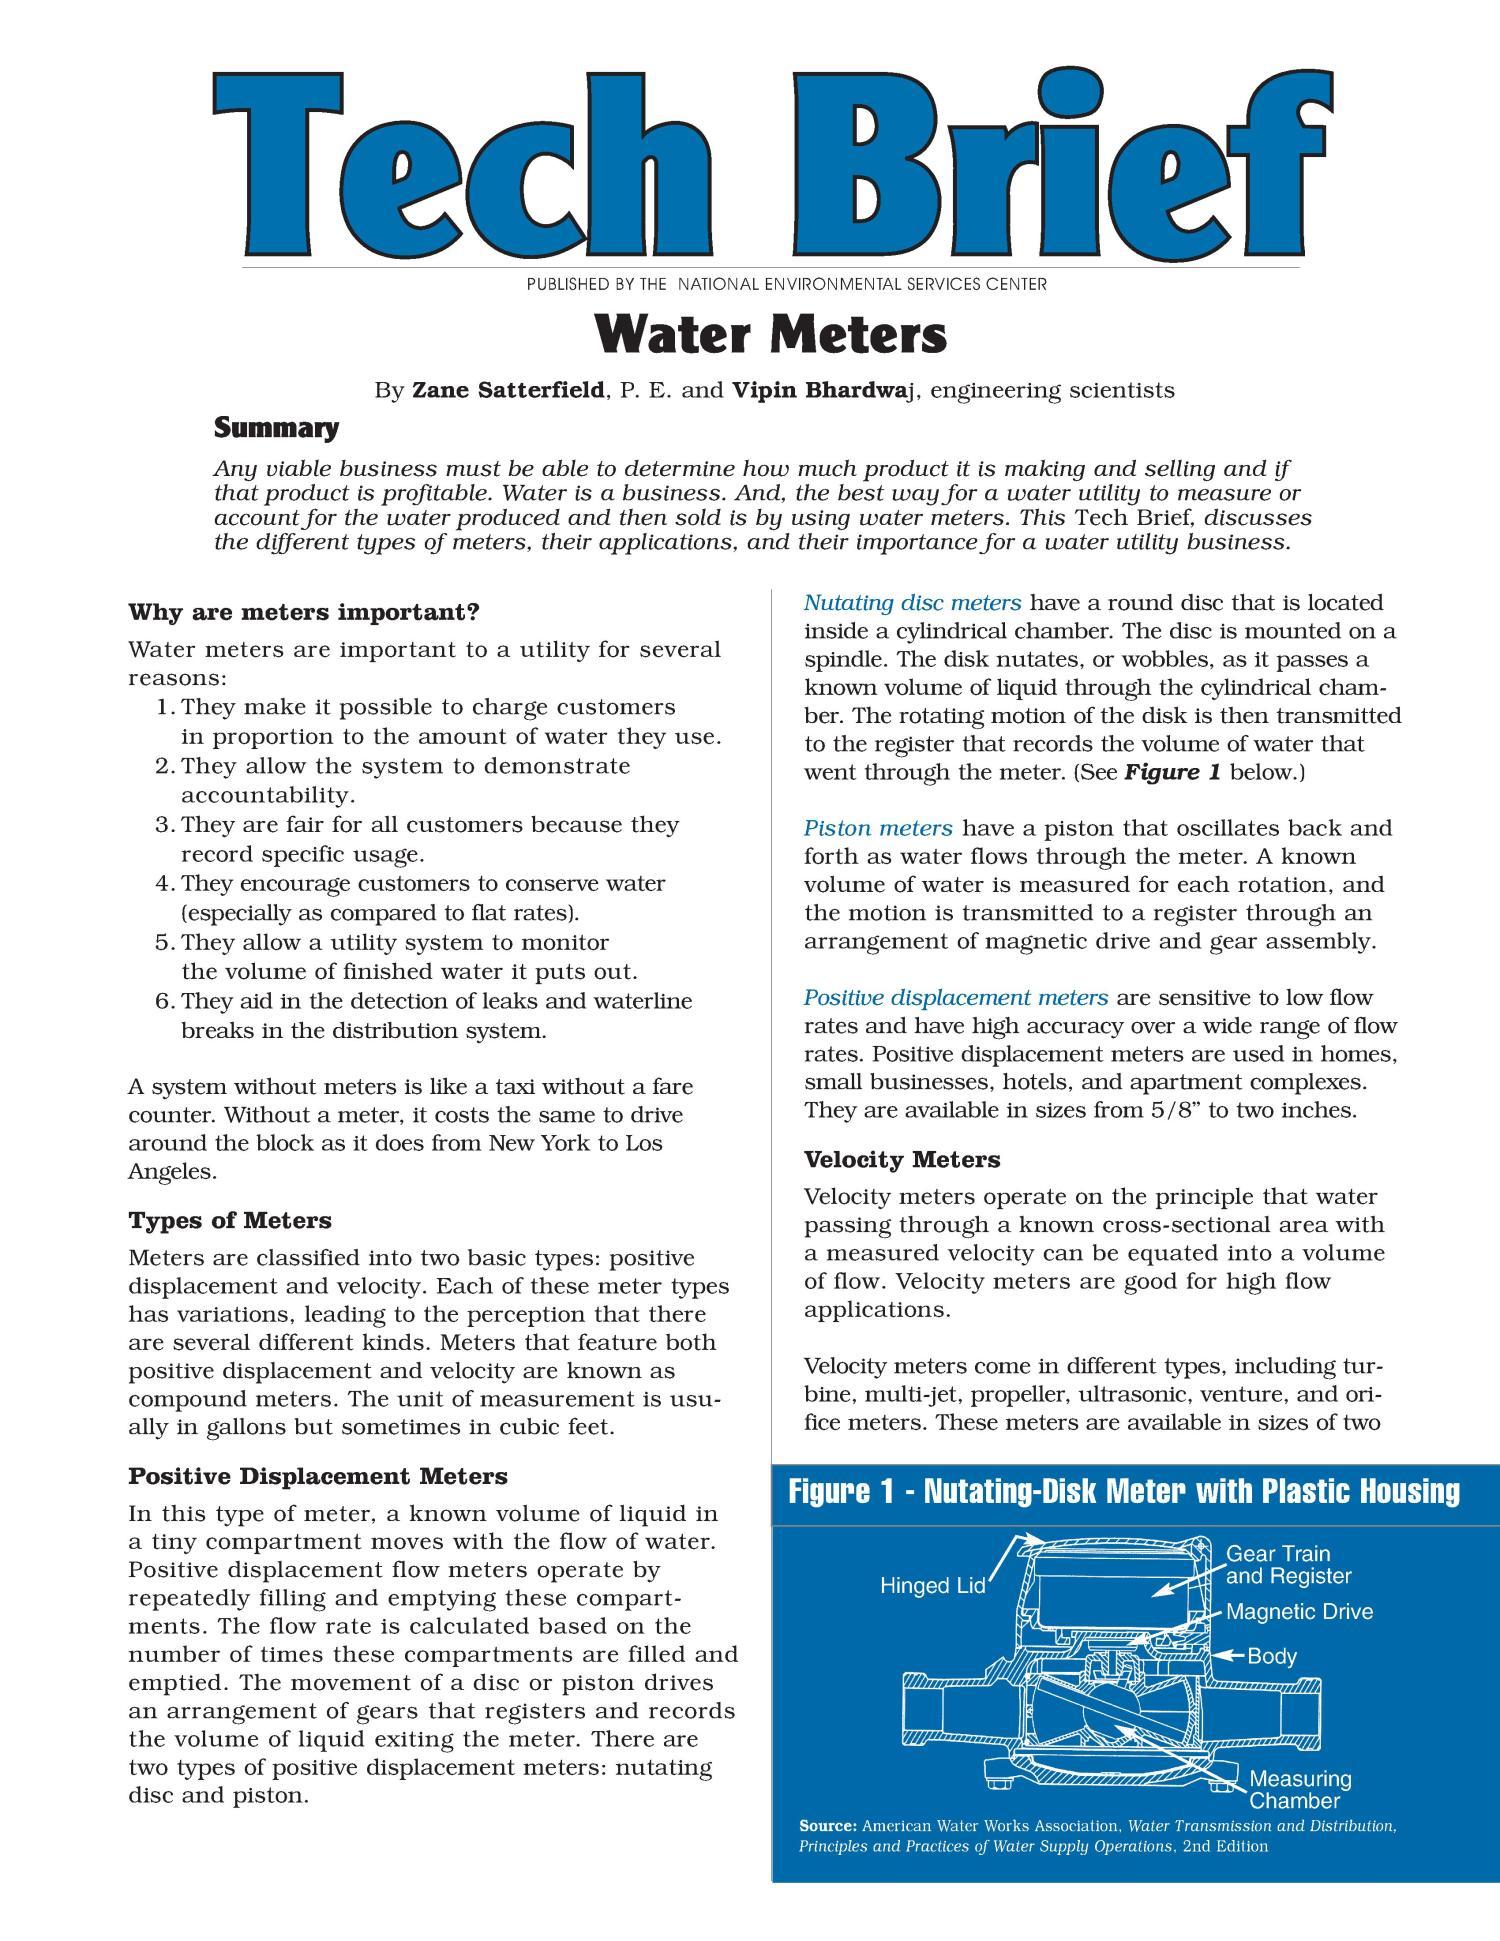 Is the water meter profitable? 12